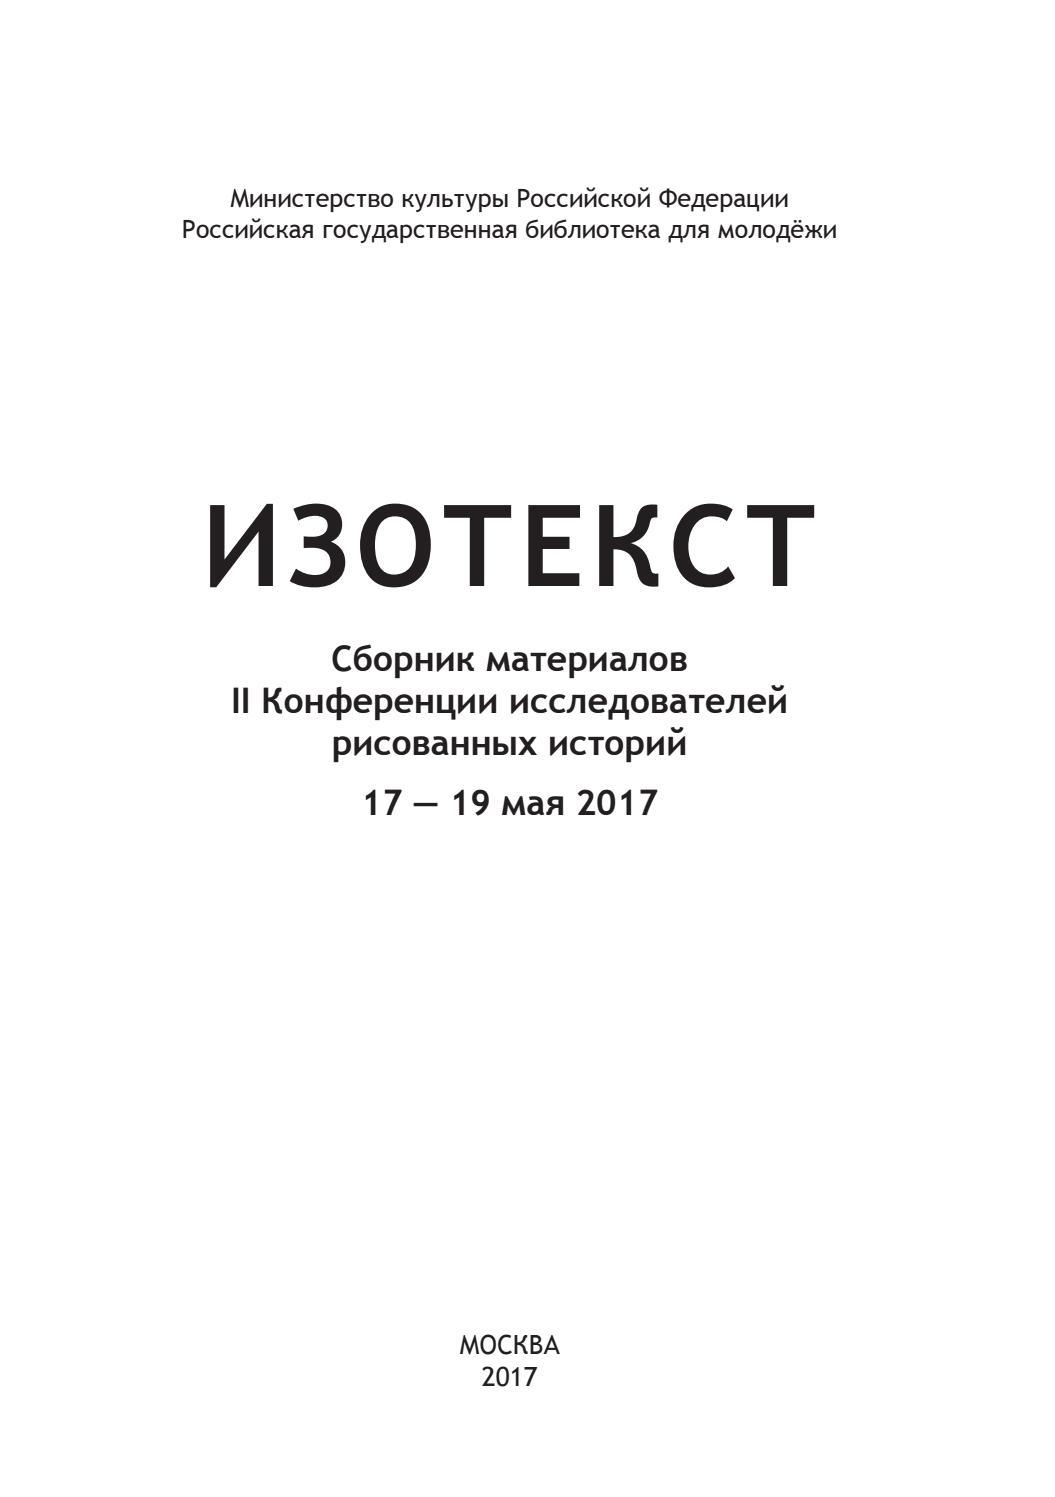 Western Economic Game Comic Вестерн Экономическая Игра Комикс in Russian